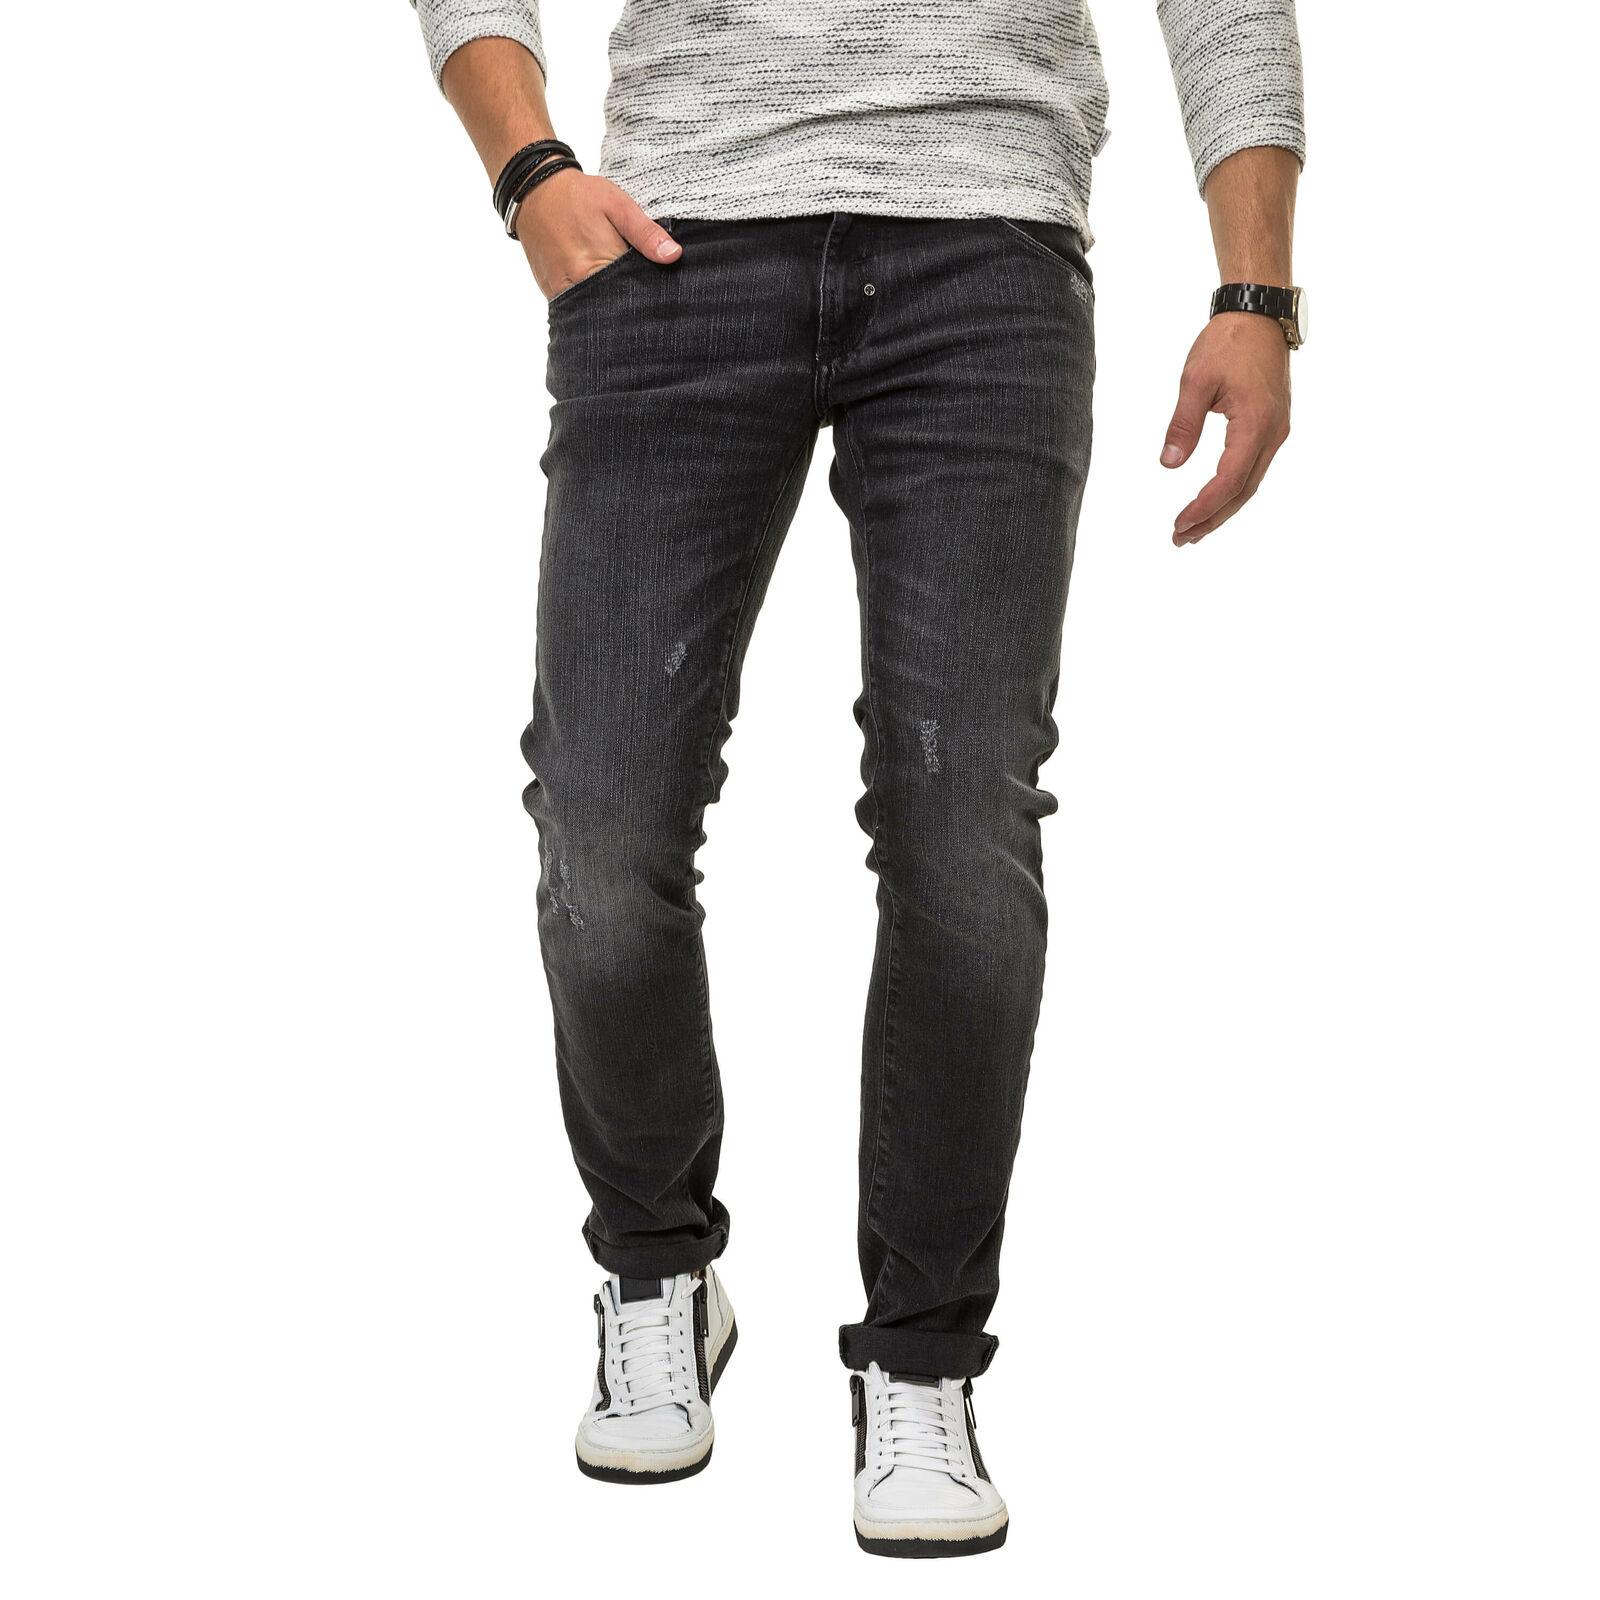 Antony Morato Herren Skinny Jeans Herrenhose Denim Lange Hose Slim Fit Jeanshose